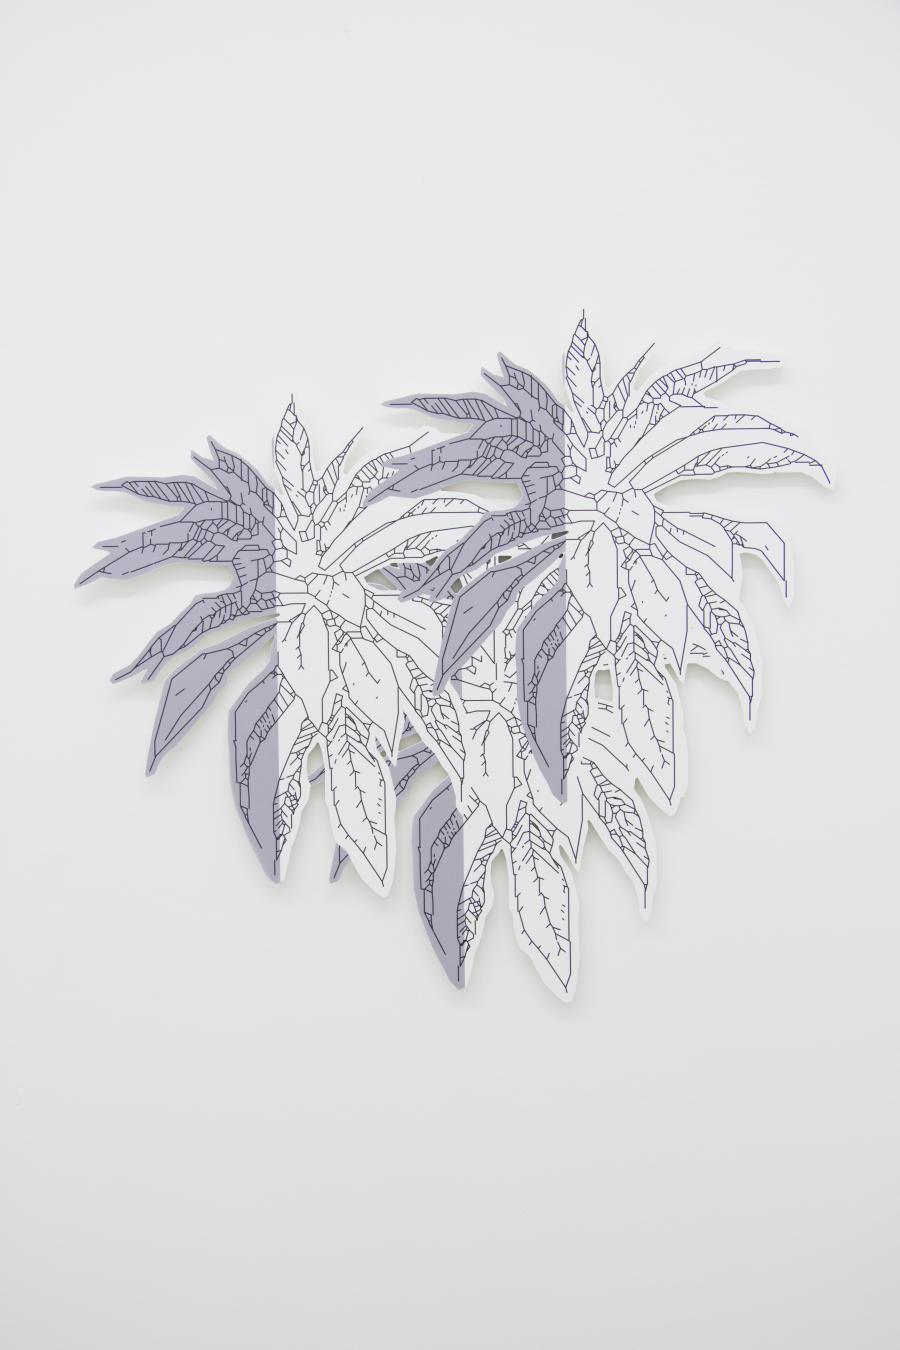 Richard Nikl, 3 Plants, UV-print on PVC, 86 x 79 cm, 2015